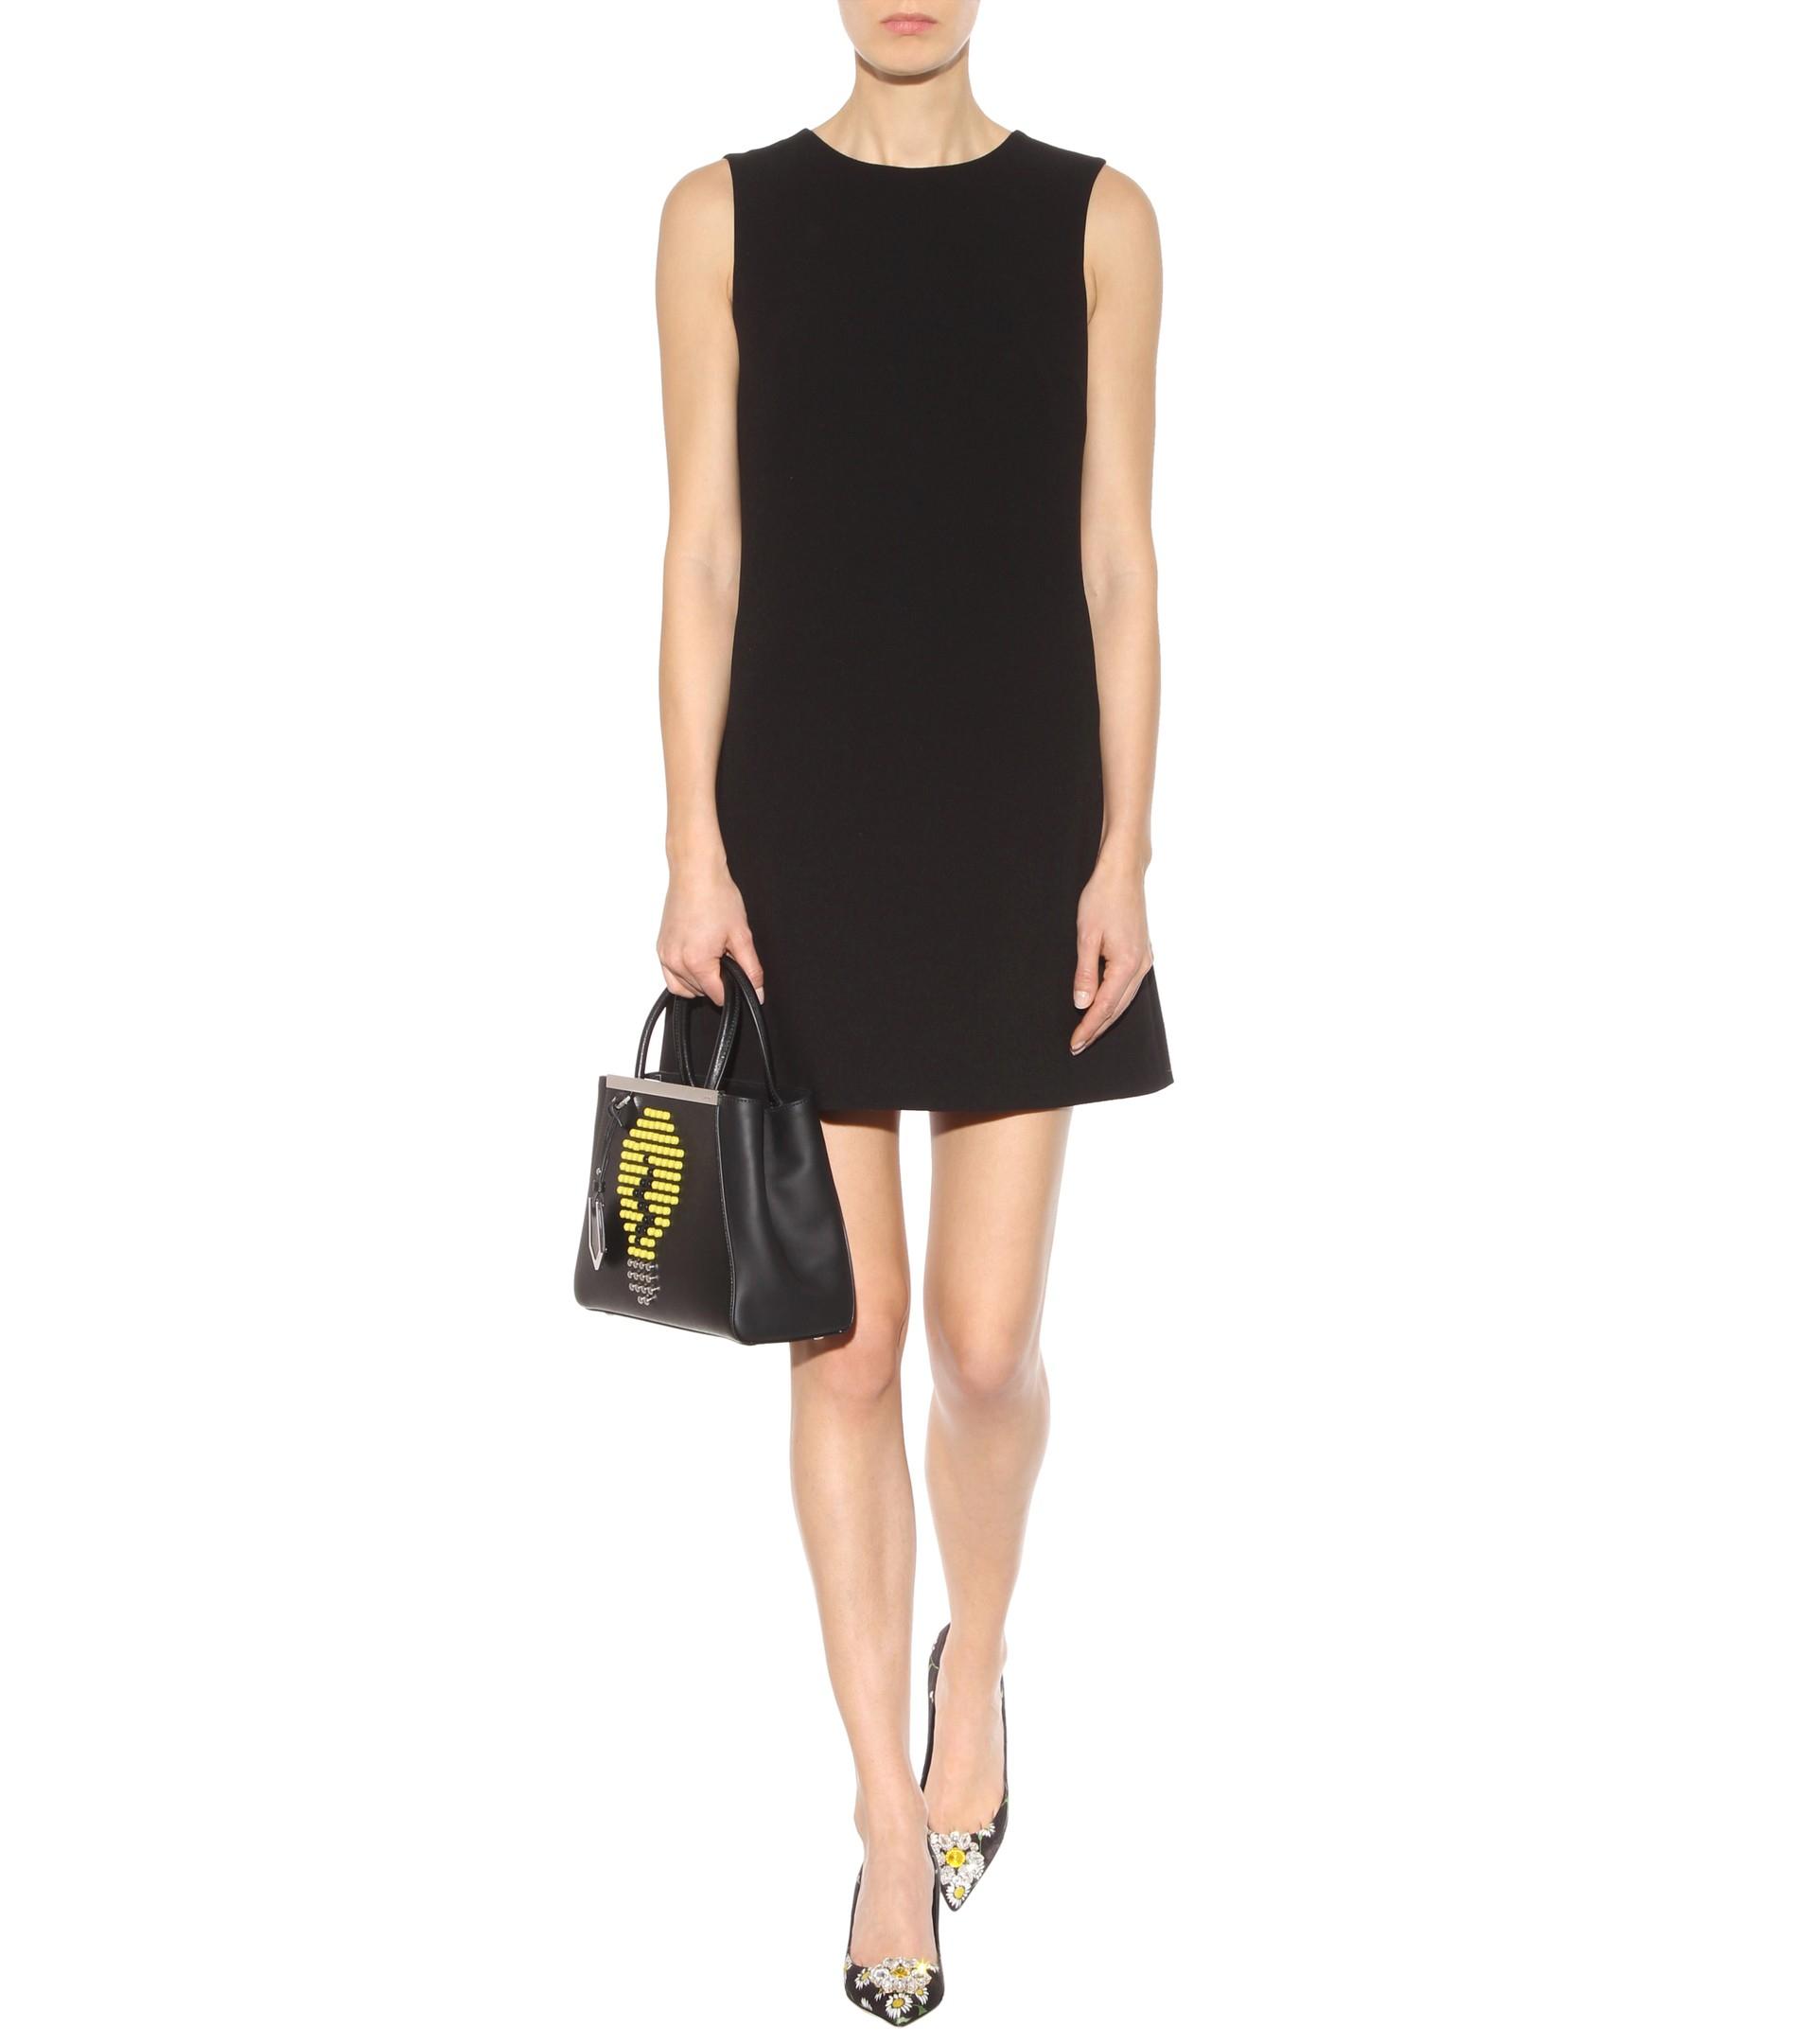 Bellucci embellished leather pumps Dolce & Gabbana y7lOa